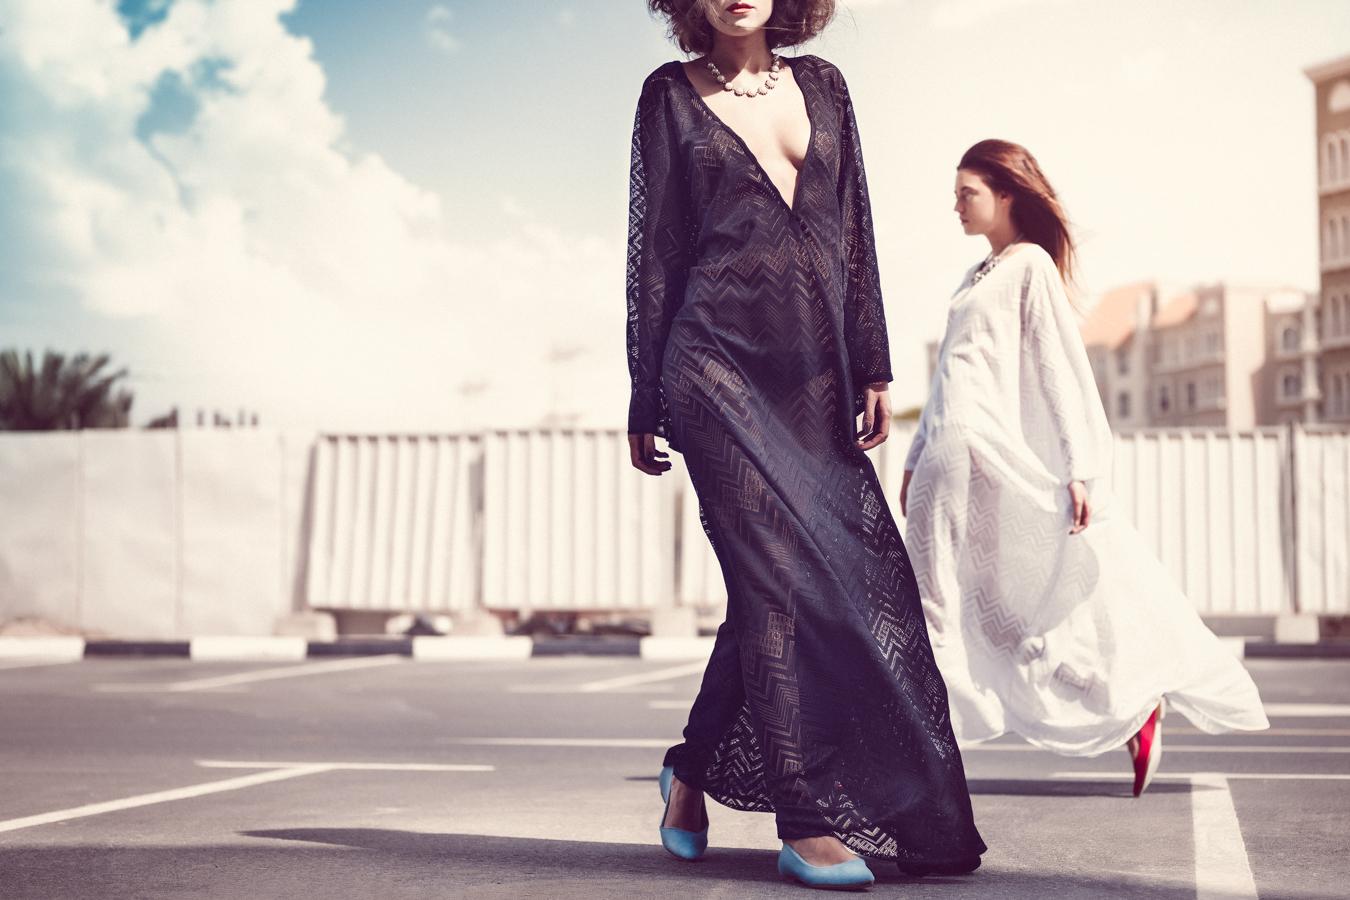 Fashion Photographer: Atif AbuSamra. Photo shoot styled by Ivana Arsenijevic and Andrea Samardzic. Hair style by Kelly Stewart and make up by Marcia Lima. Models: Jovana Mitic and Milana Milojevic.